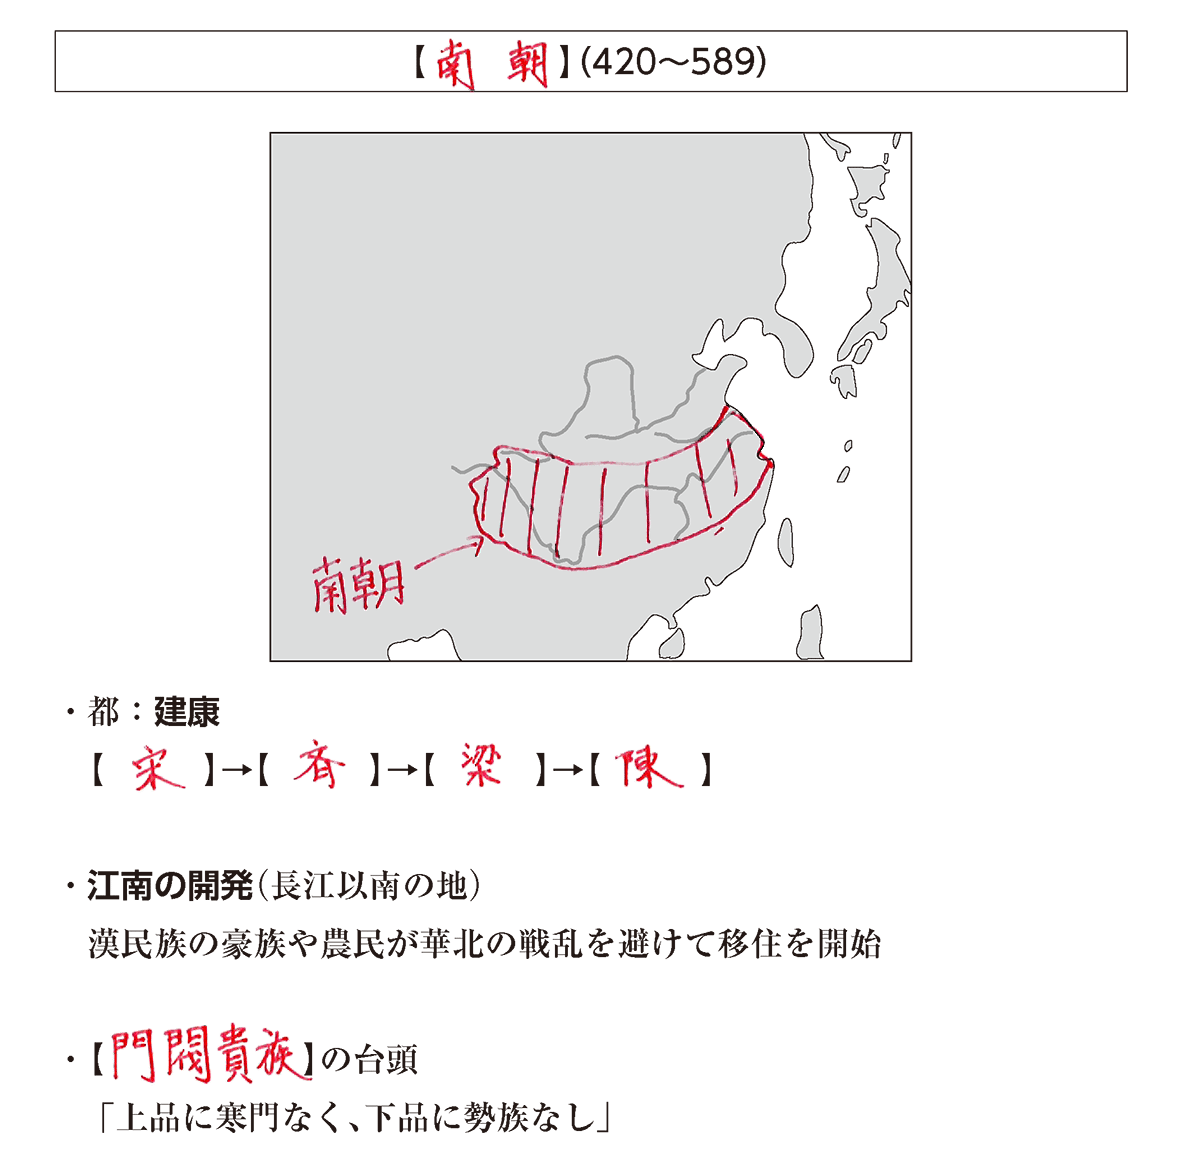 高校世界史 中国の分裂・混乱期2 答え全部